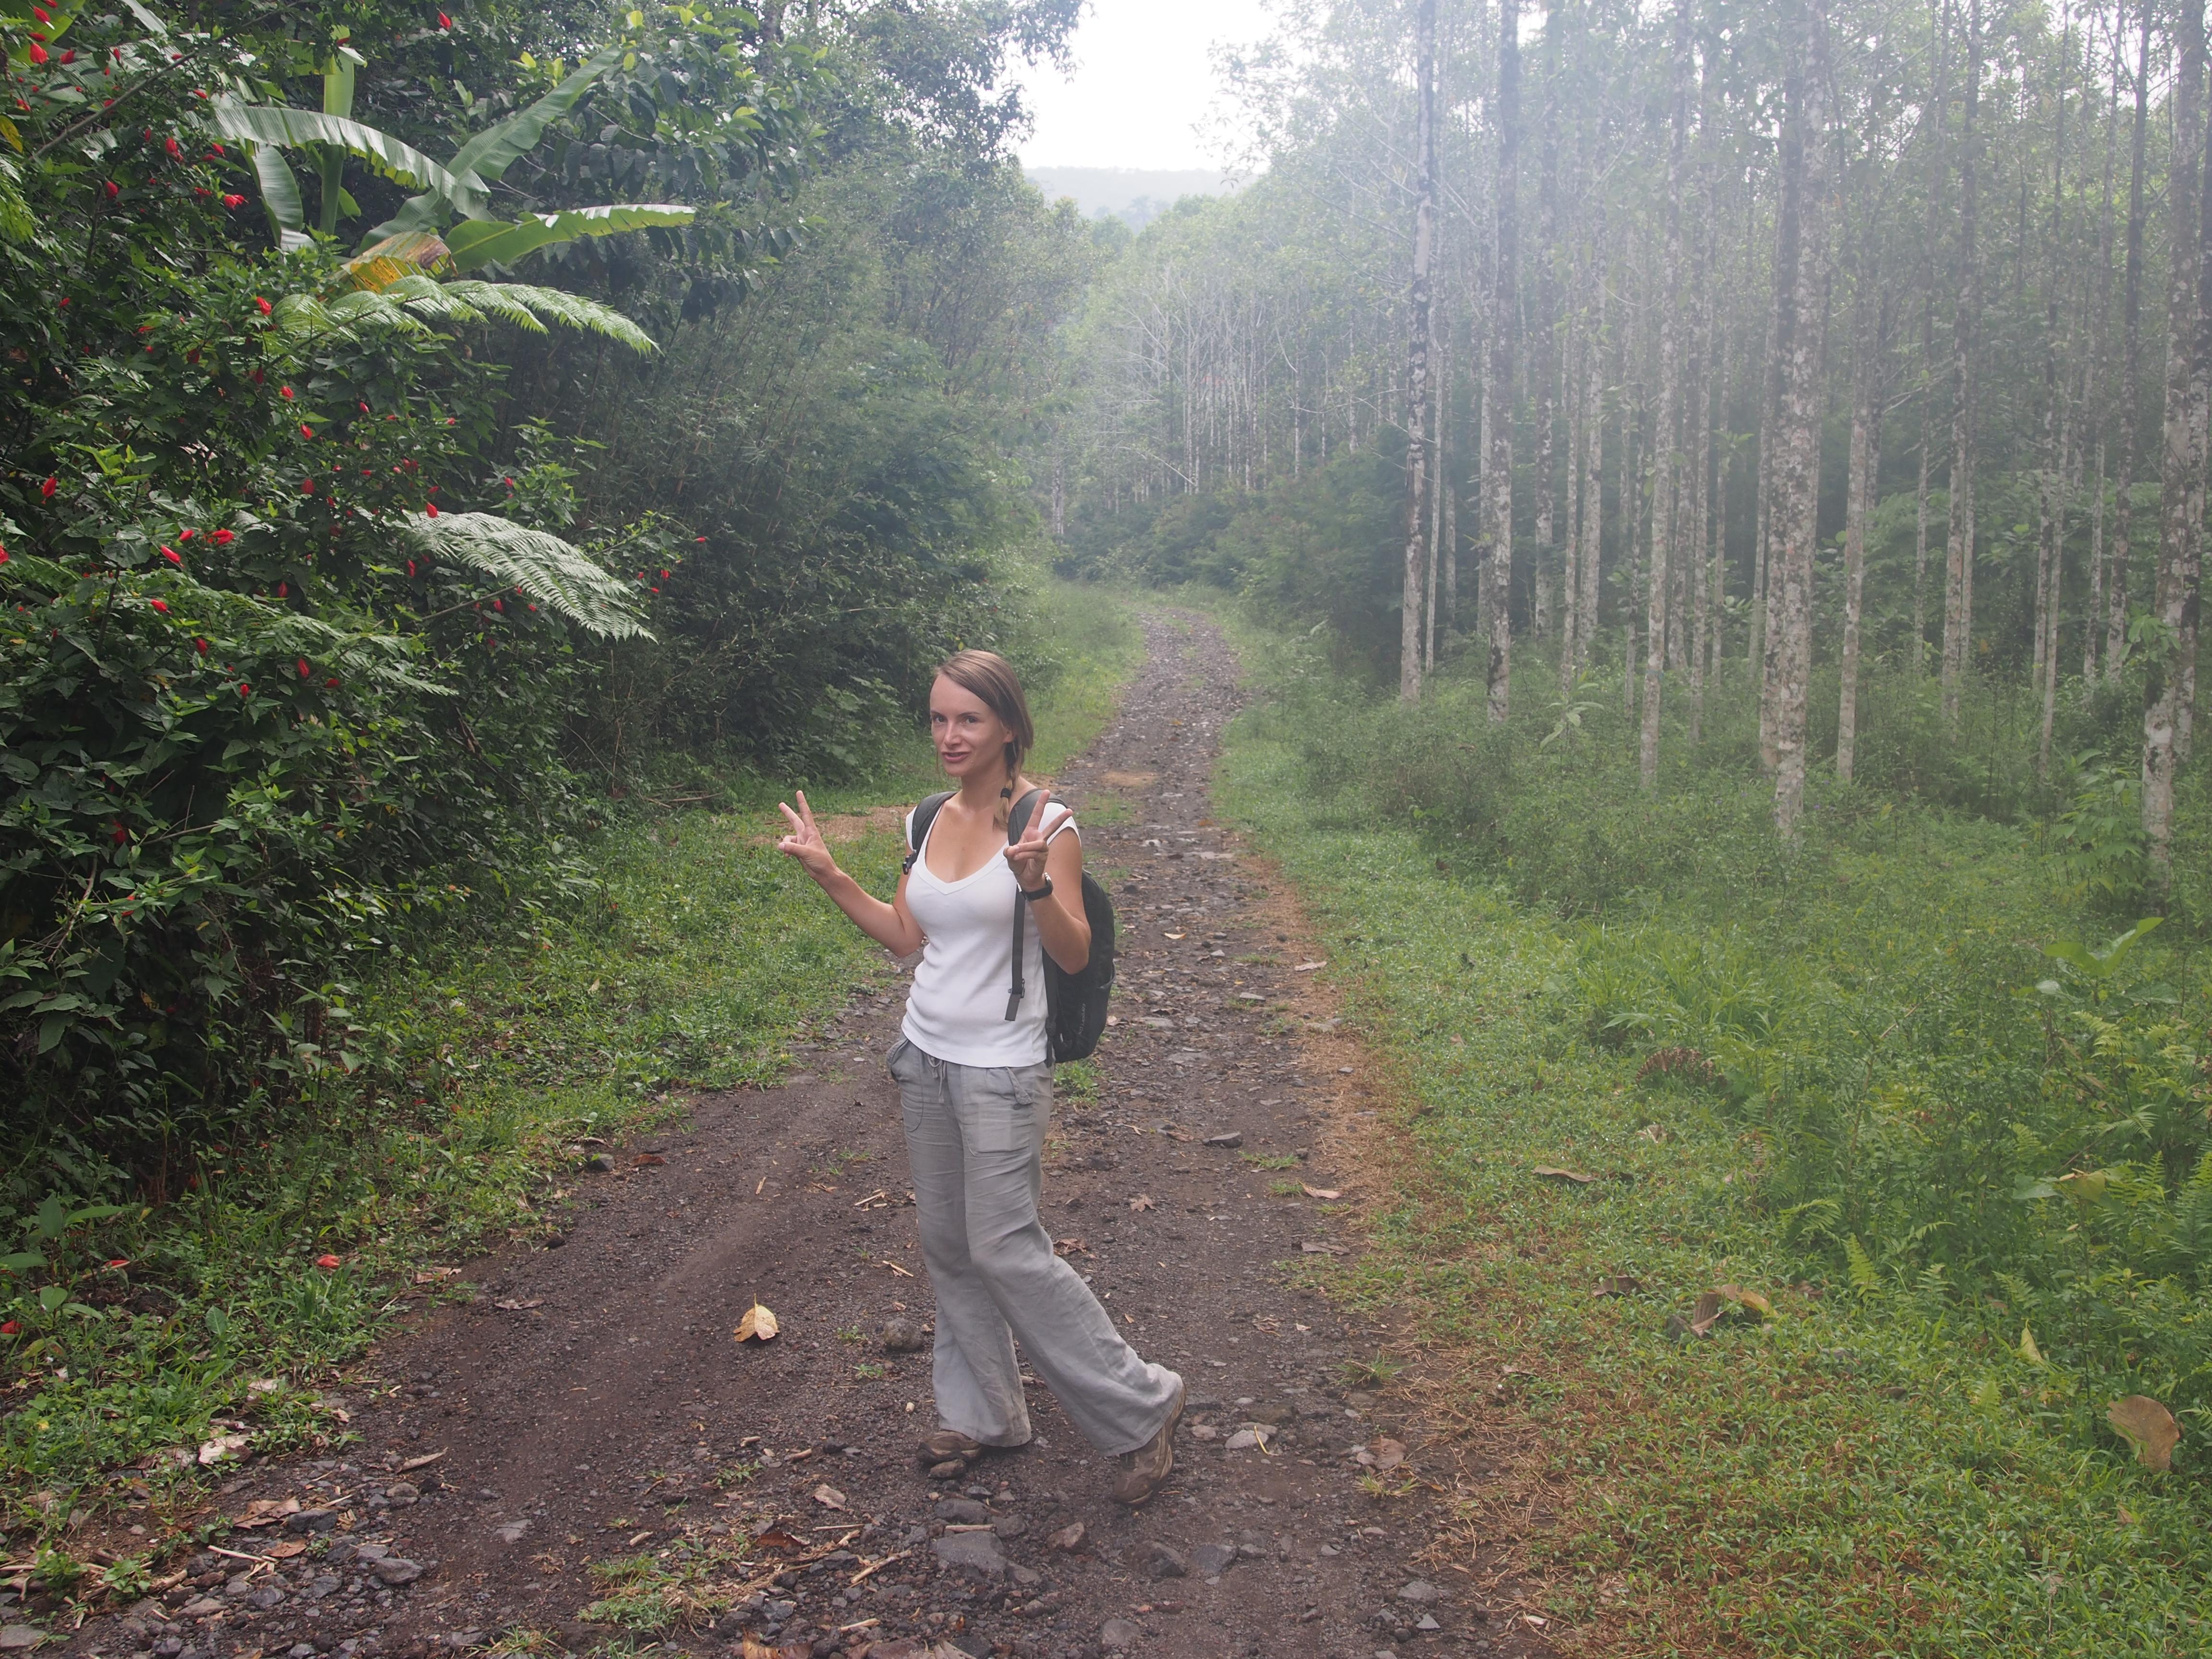 Tangkoko Batuangas Dua Saudara Nature Reserve Road Asia Gunung Mahawu